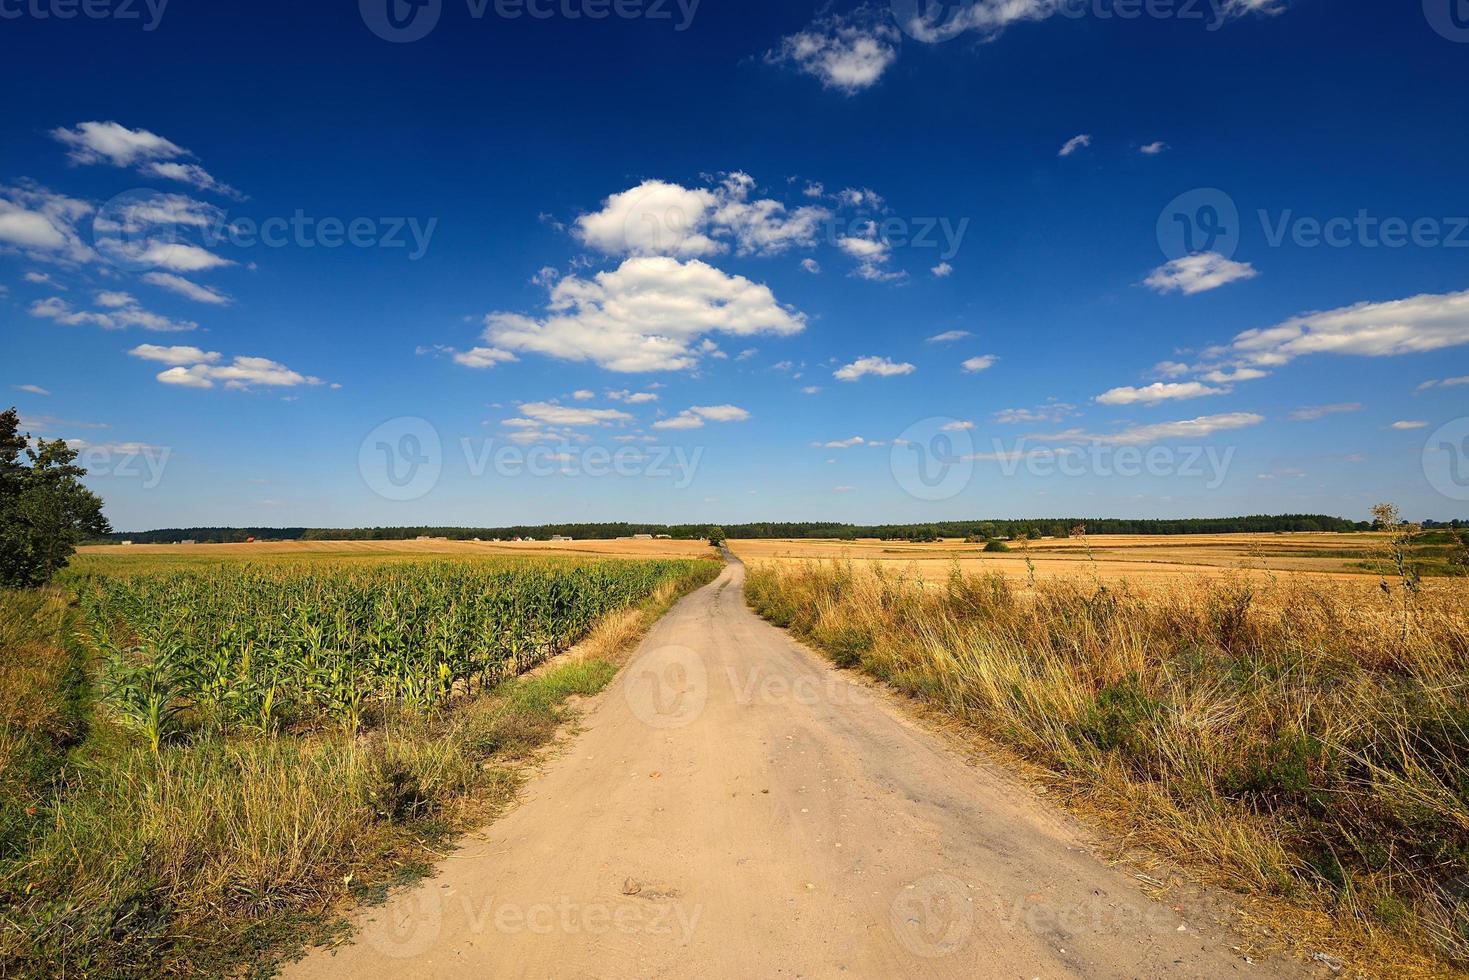 Land Landschaft. Feld. foto